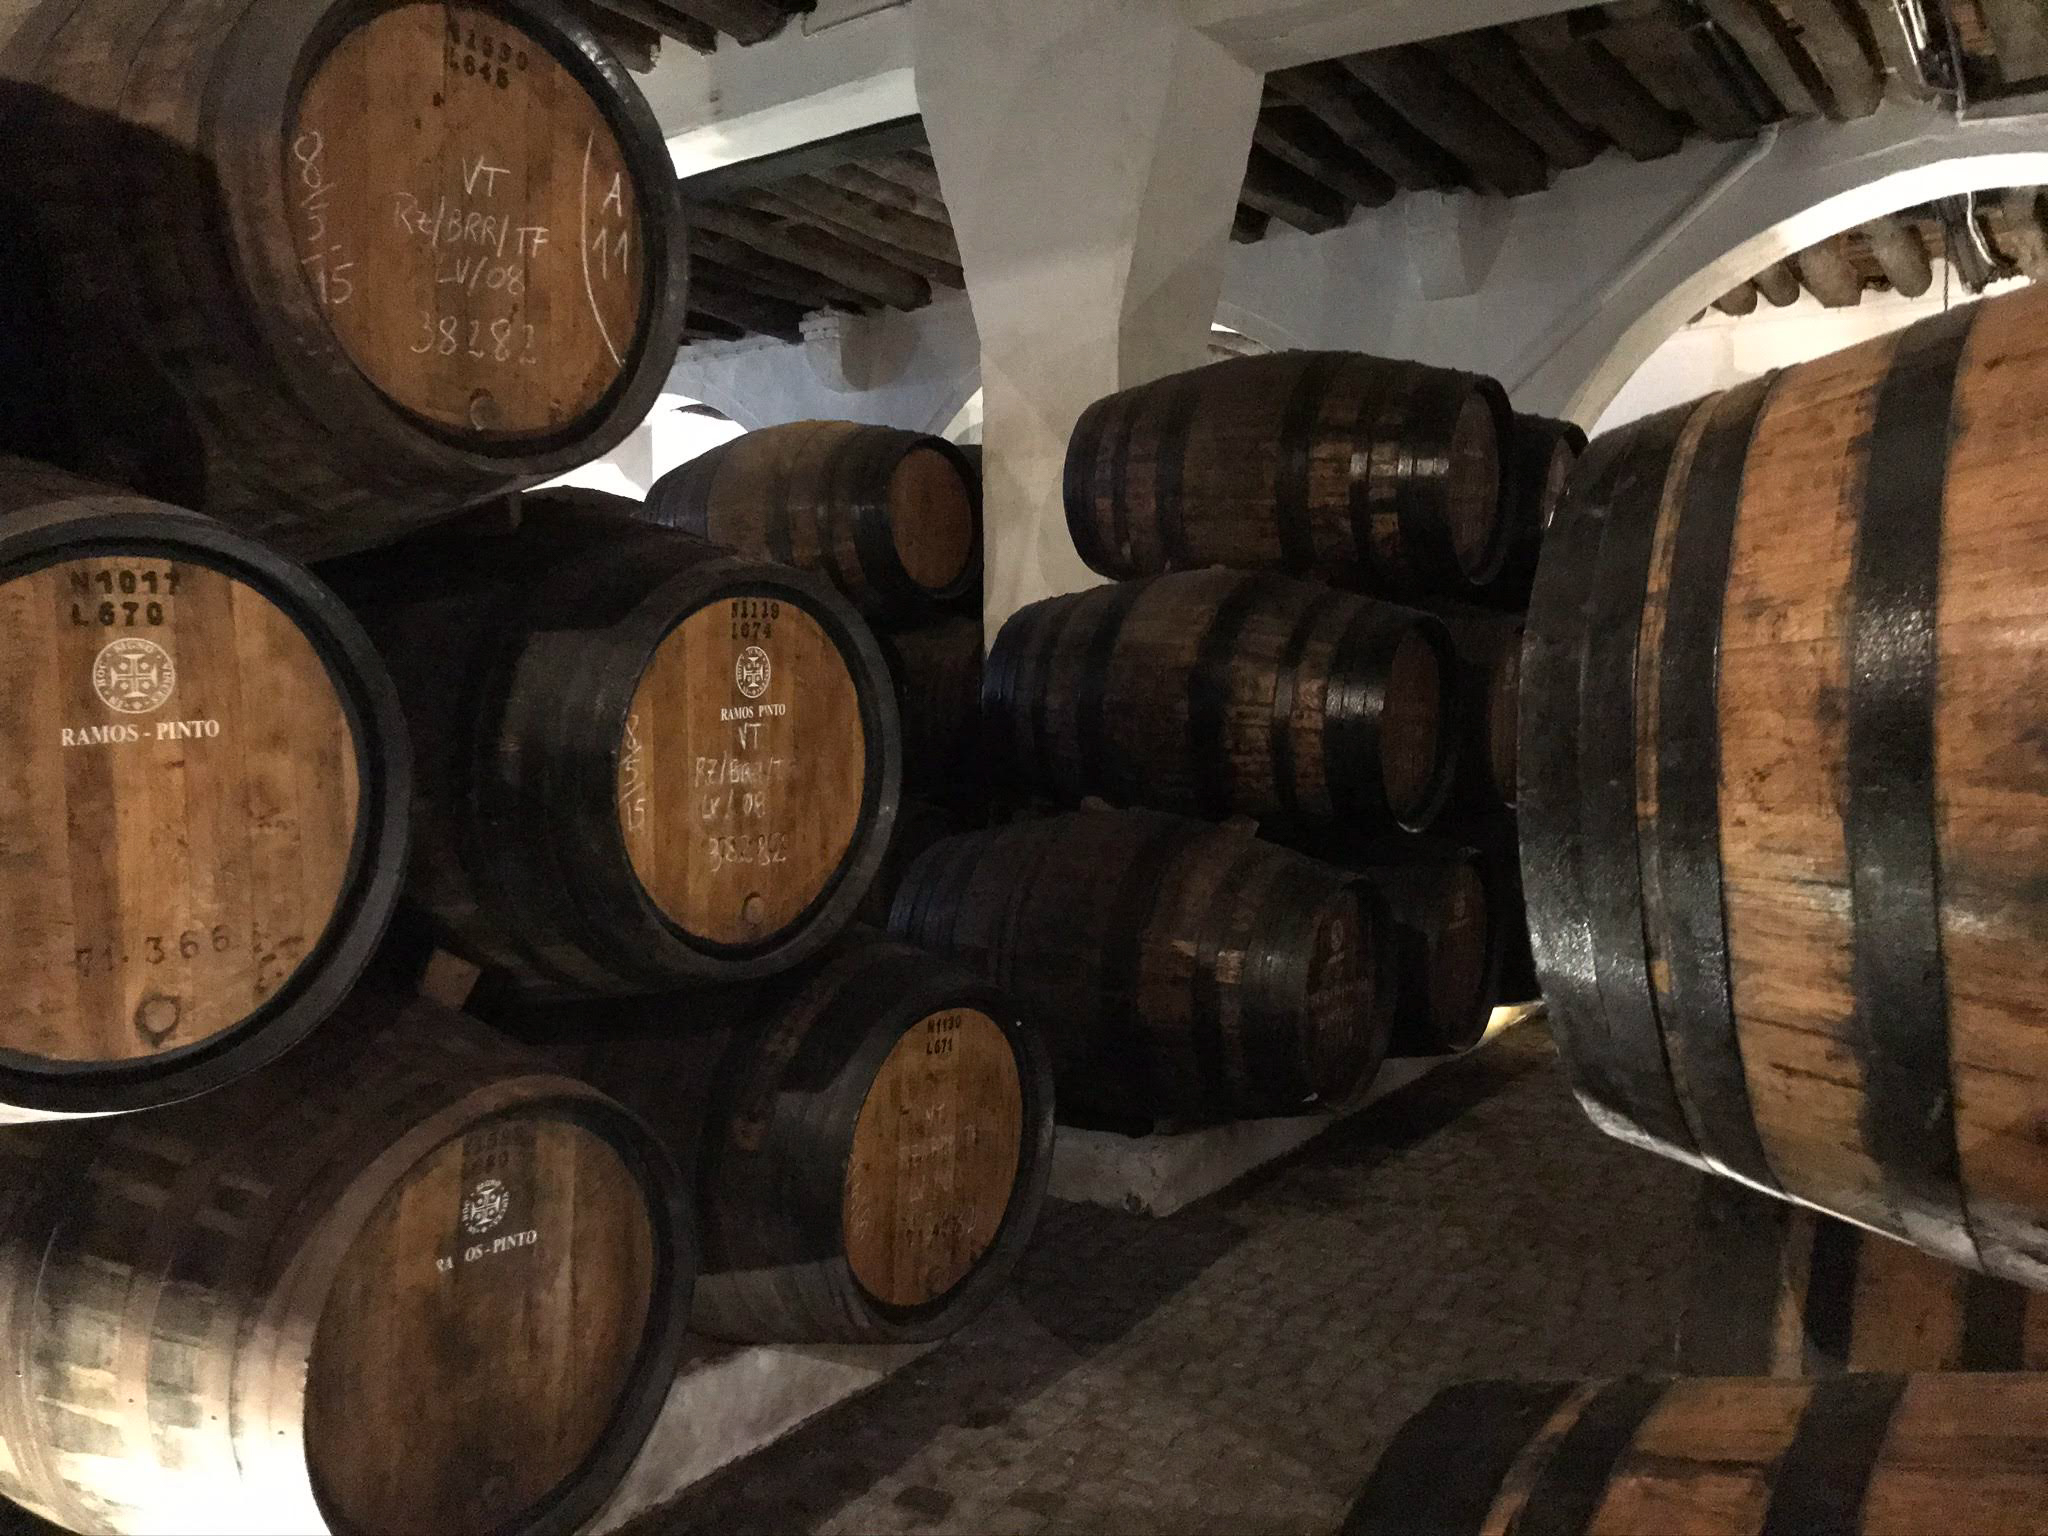 Inside a wine cellar.